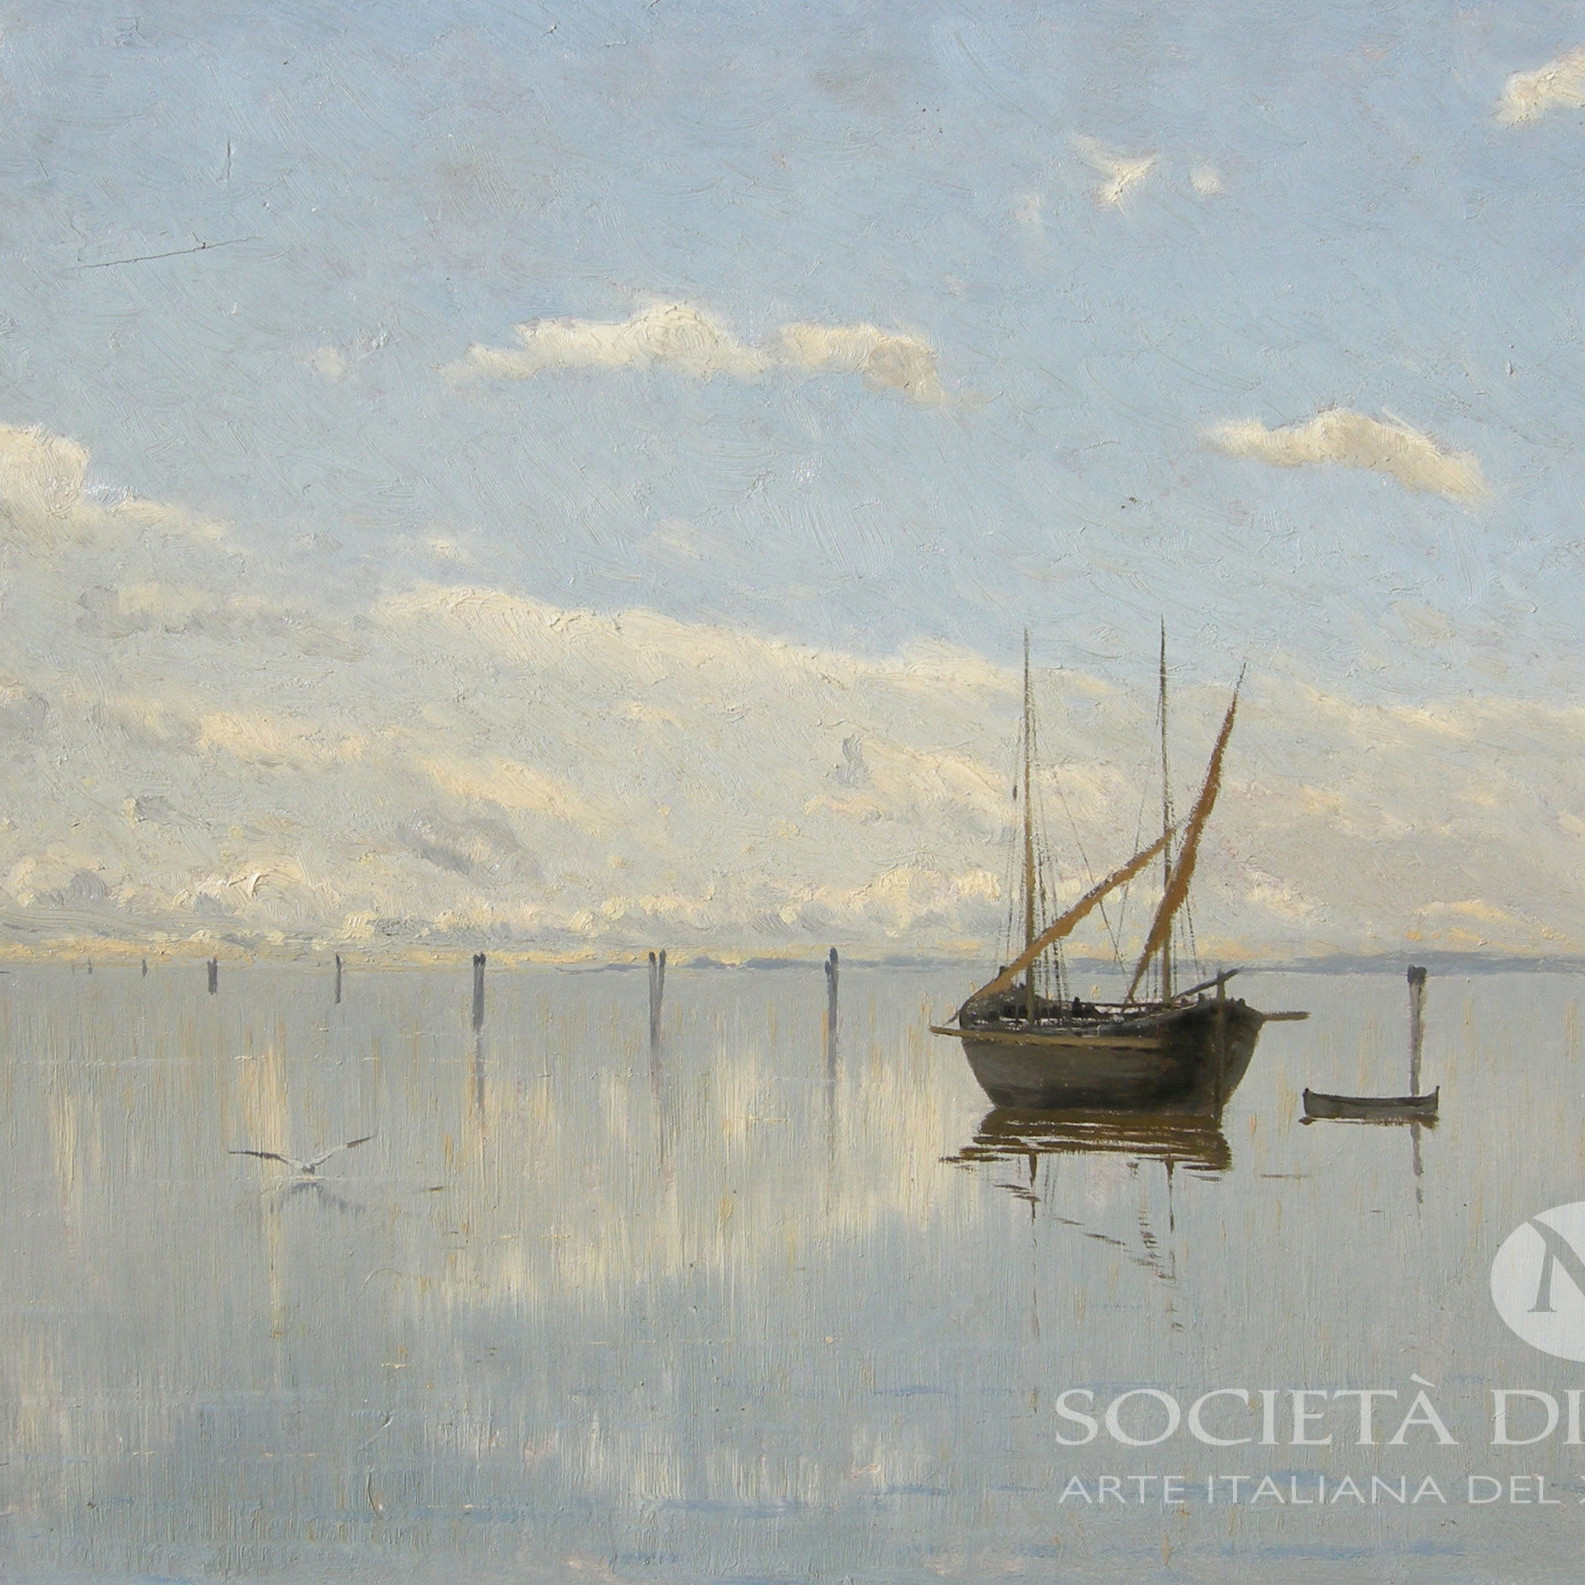 GUglielmo CIardi dipinti veneti in vendita